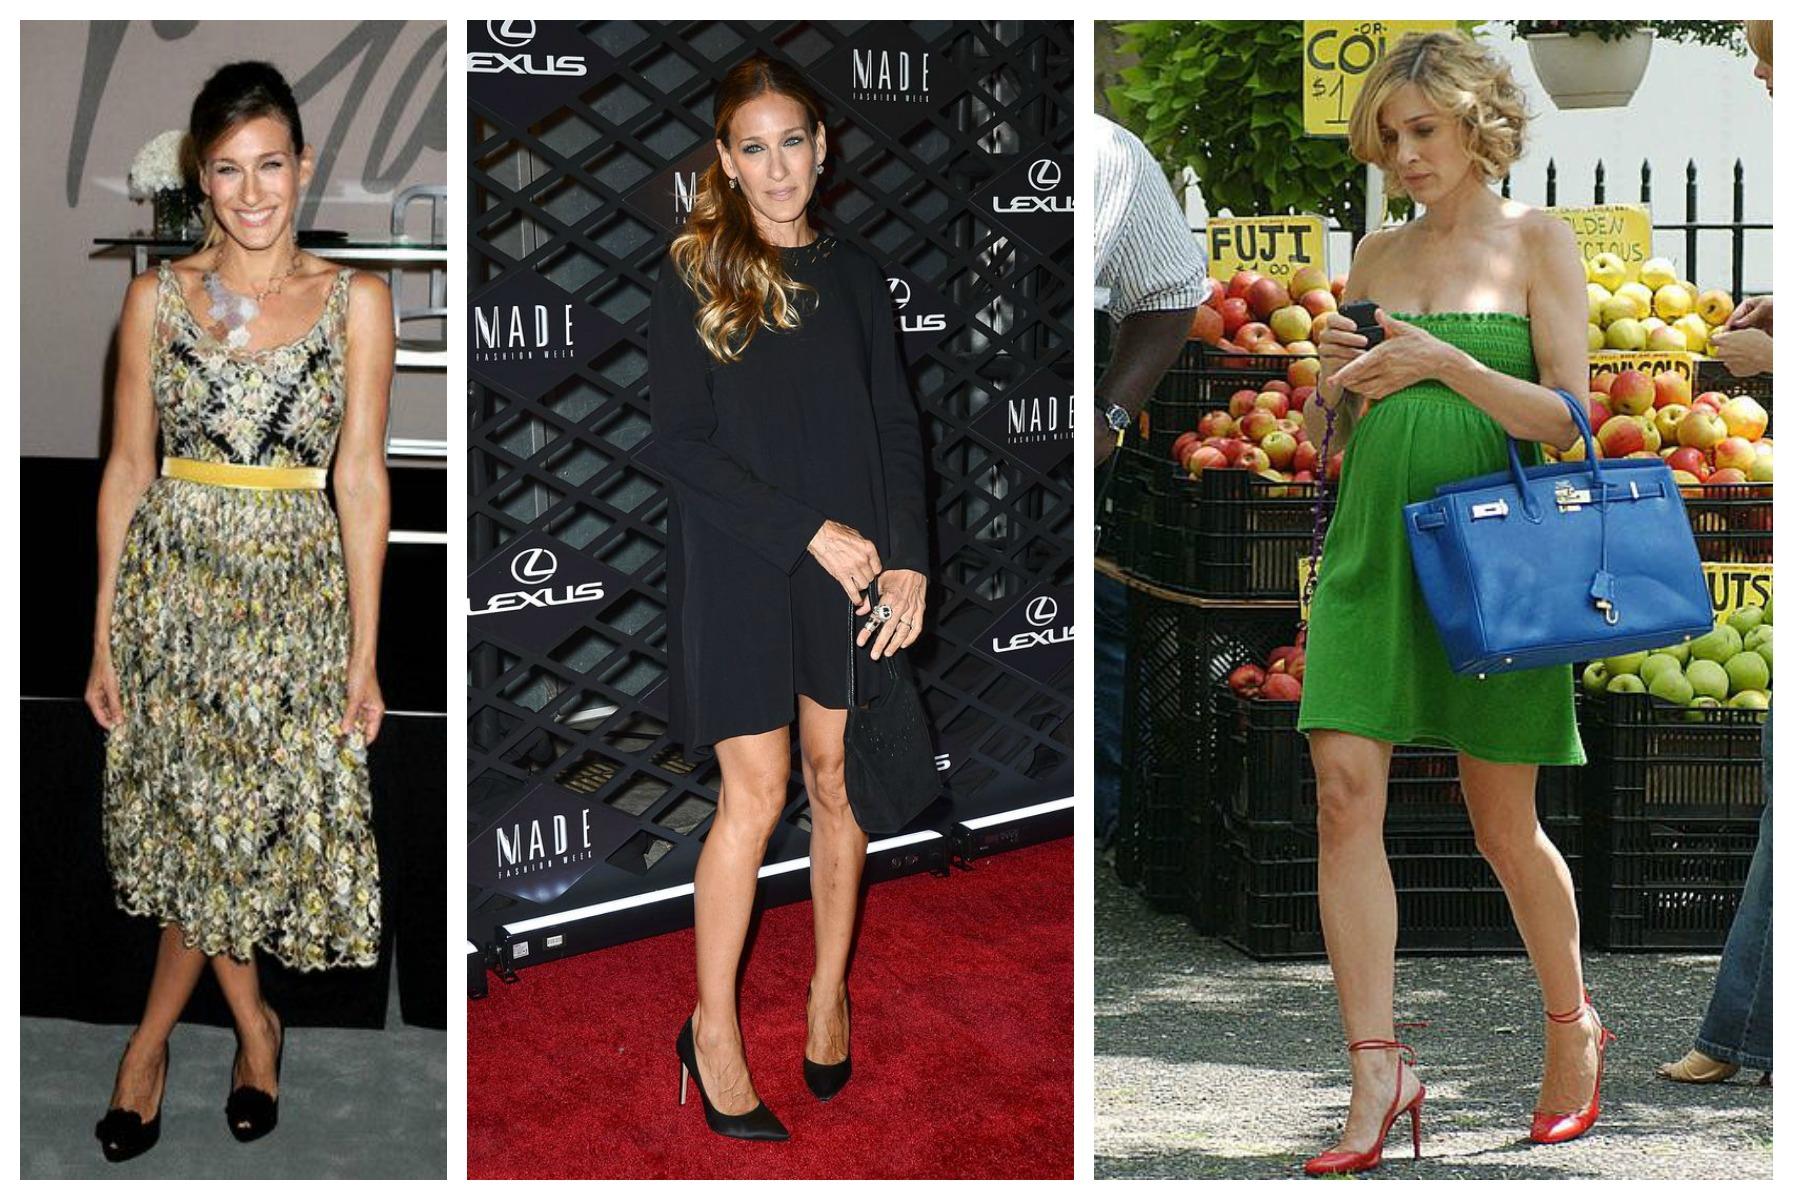 vith.es consultoria de moda estilo outfit sarah jessica parker style looks sex and the city antonio pozuelo